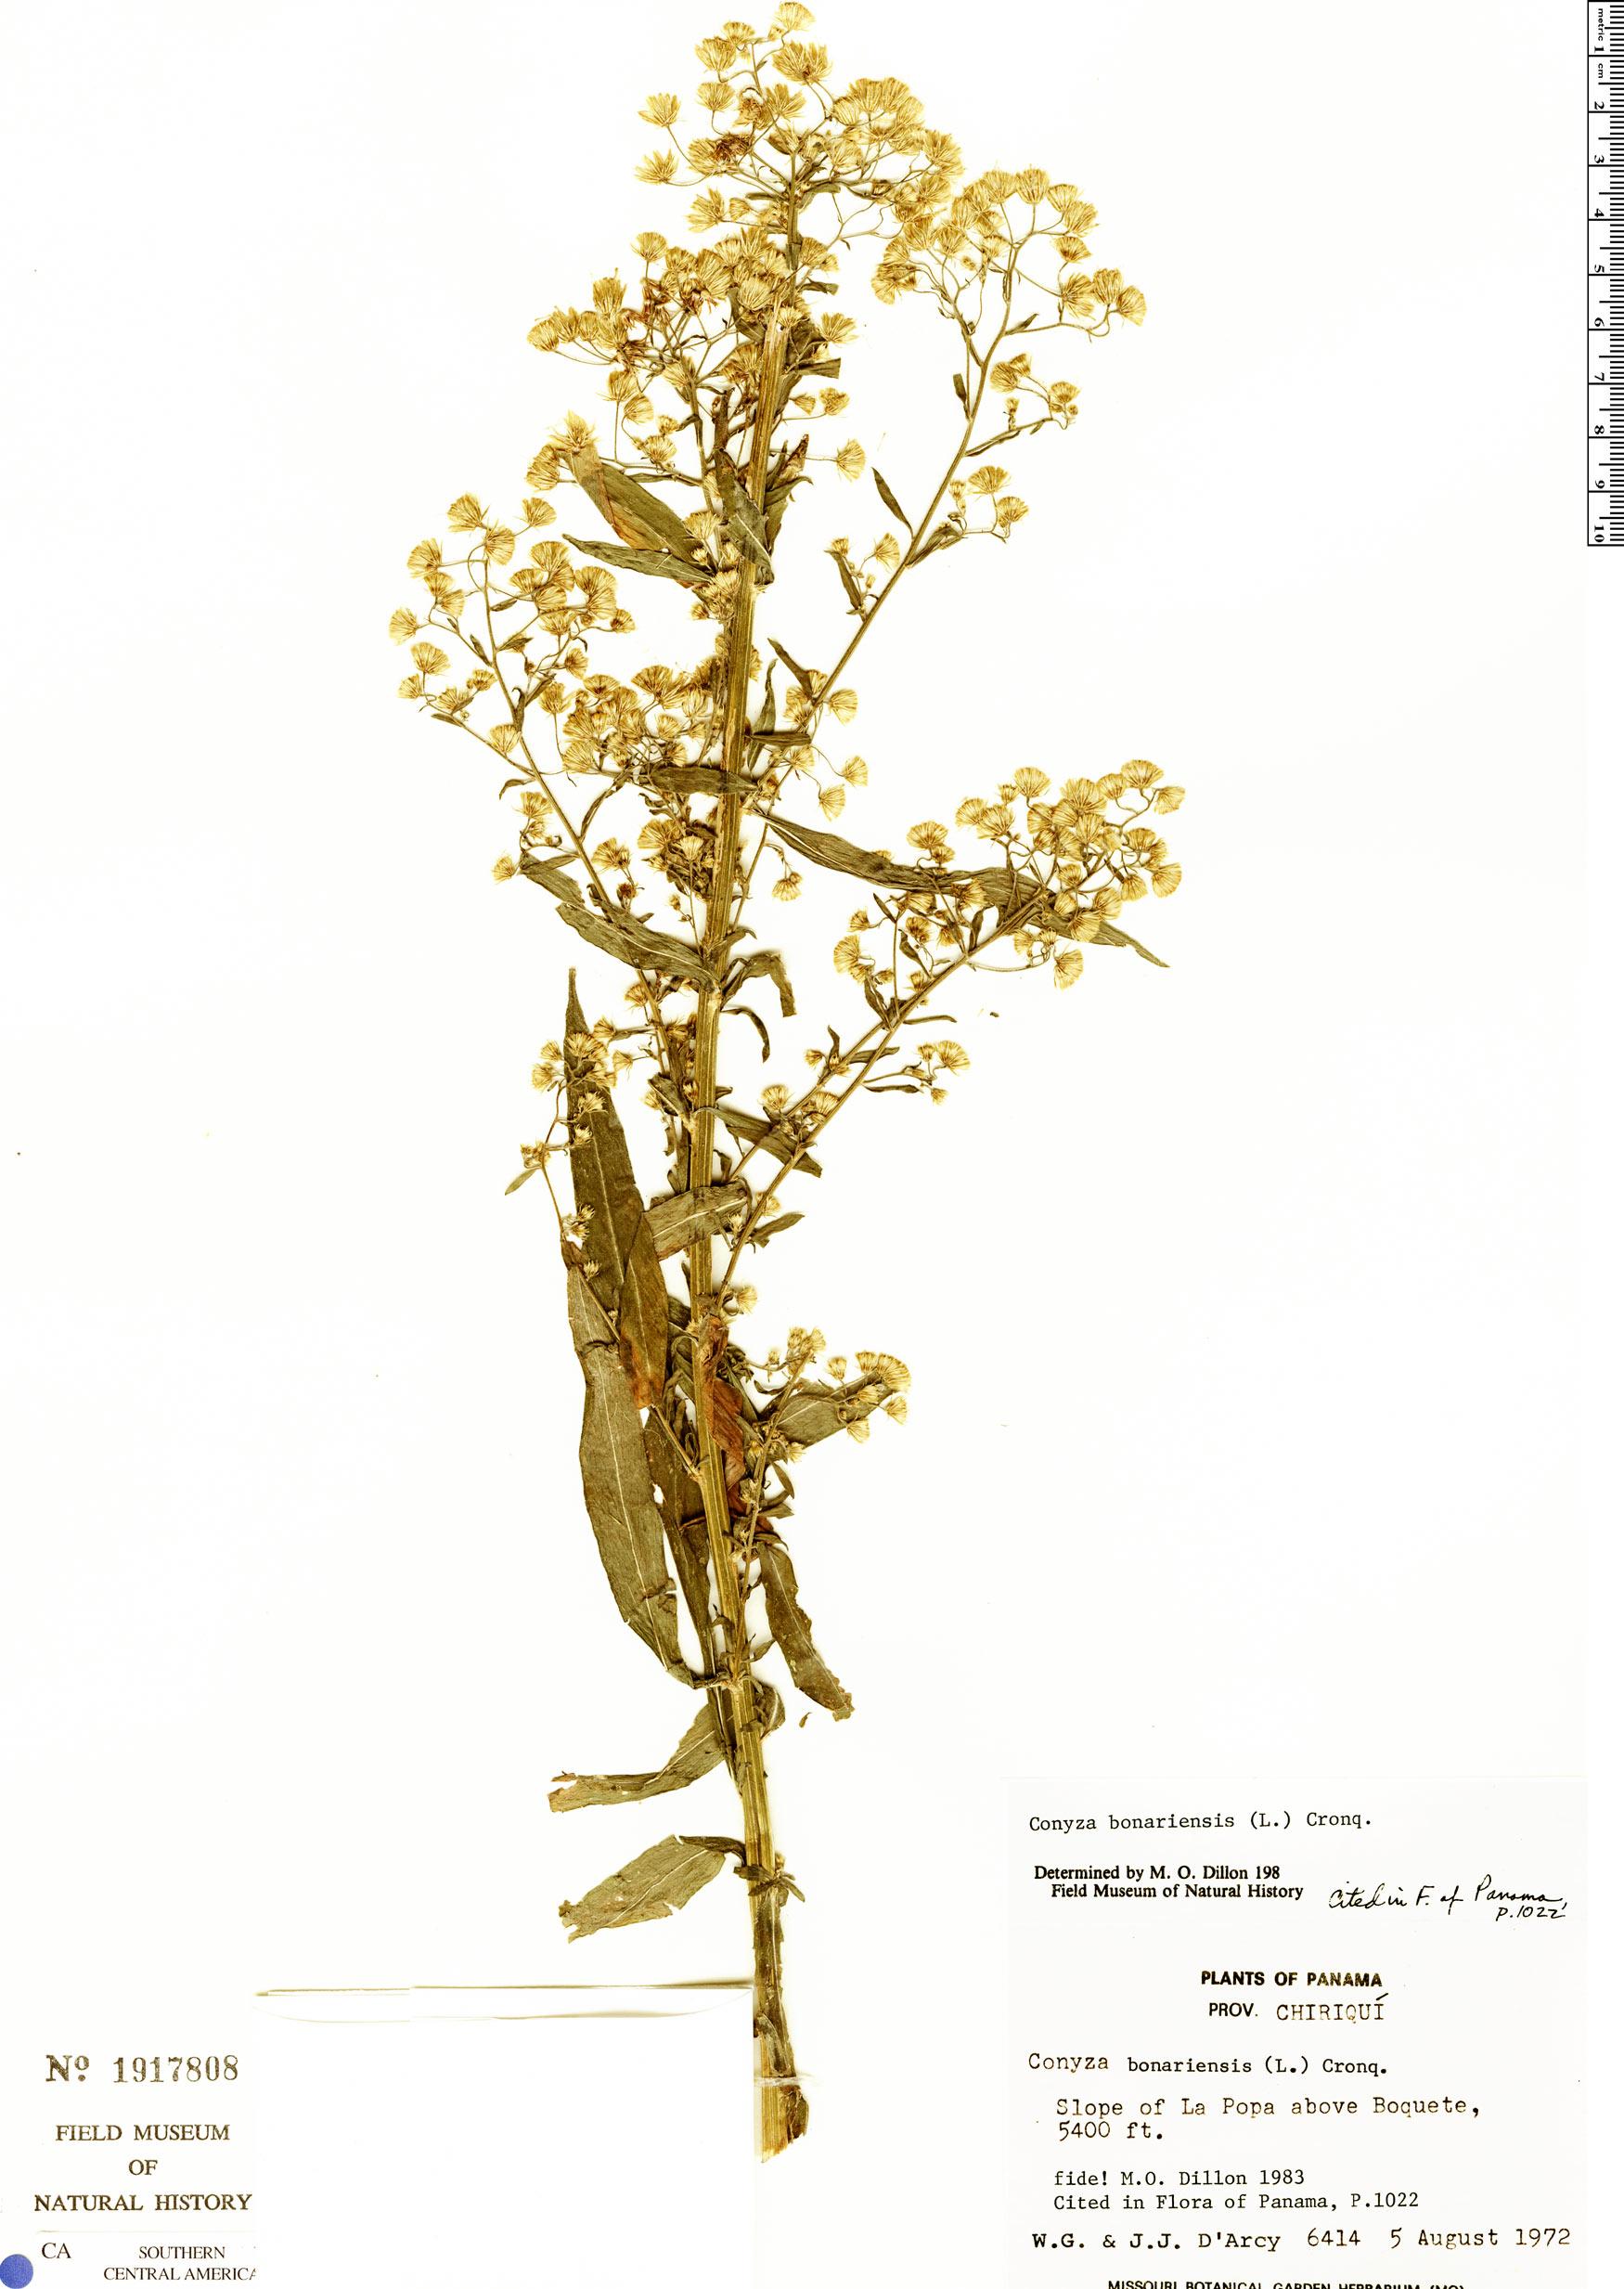 Espécimen: Conyza bonariensis